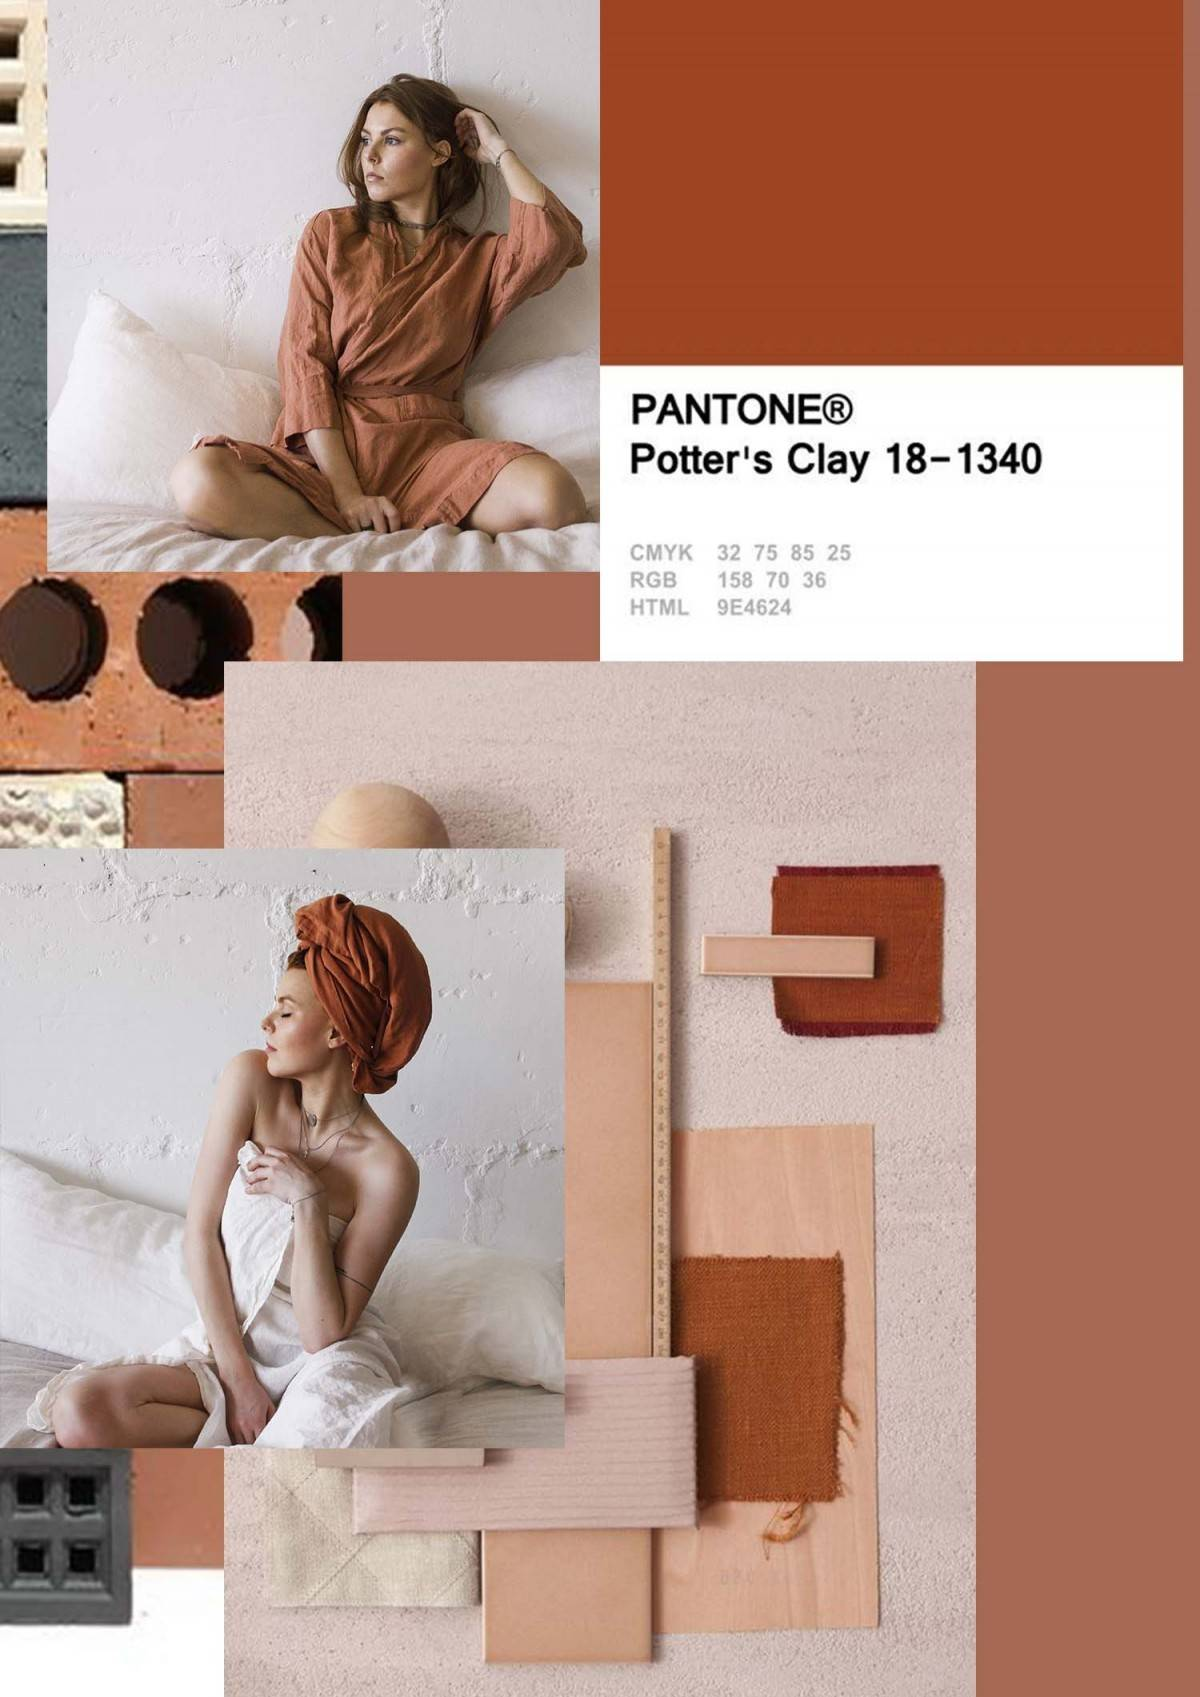 PANTONE 2019 - clay